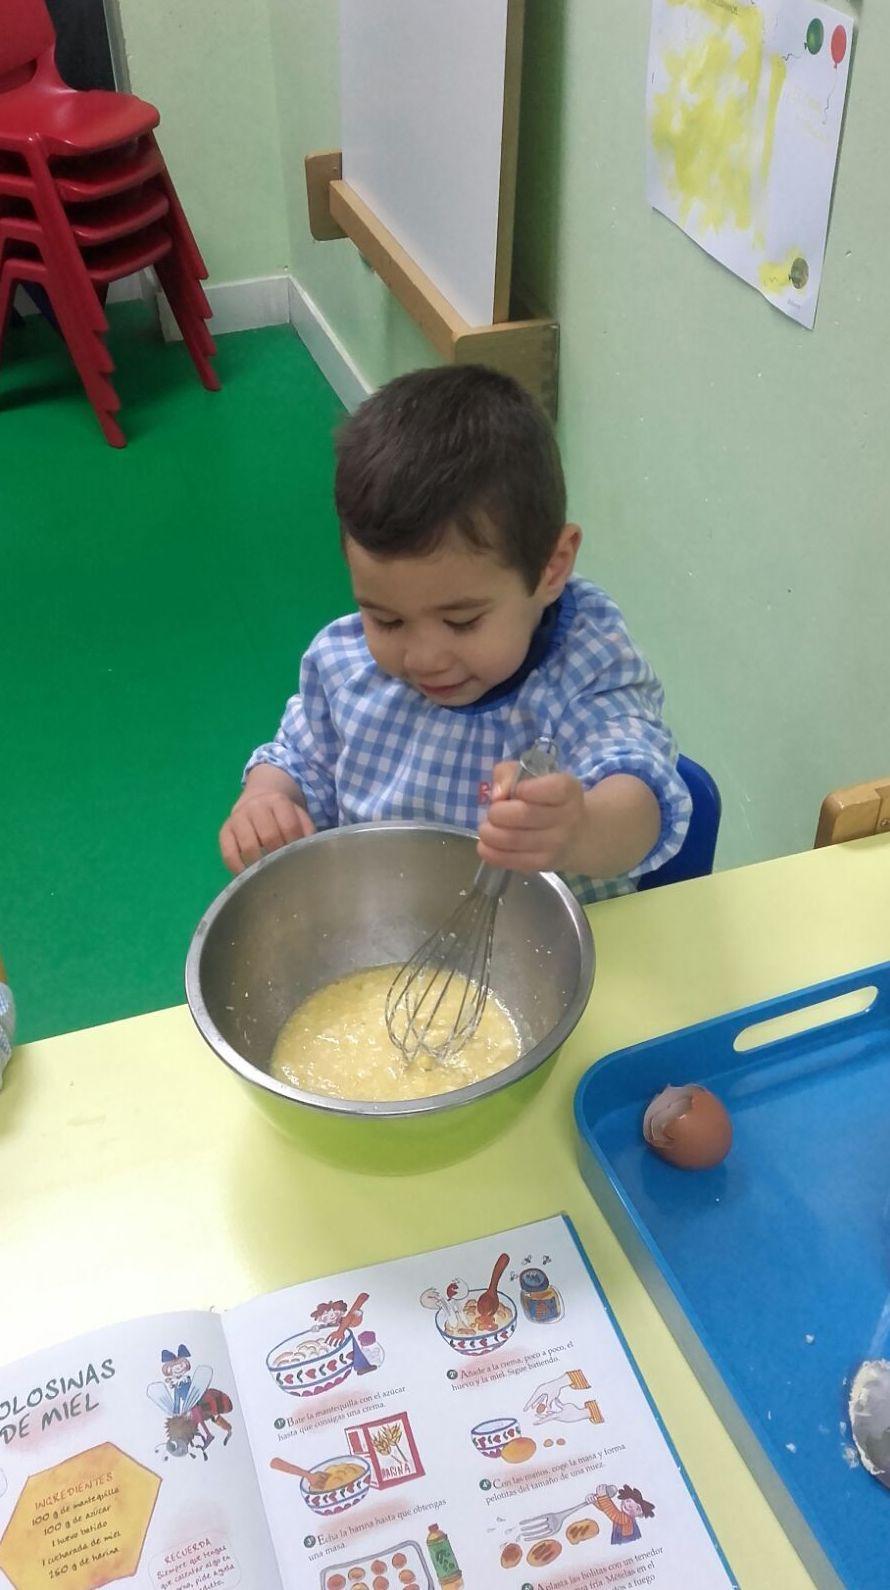 Foto 13 de Escuela infantil en Algete | E.I. Cuatro Pecas de Colores